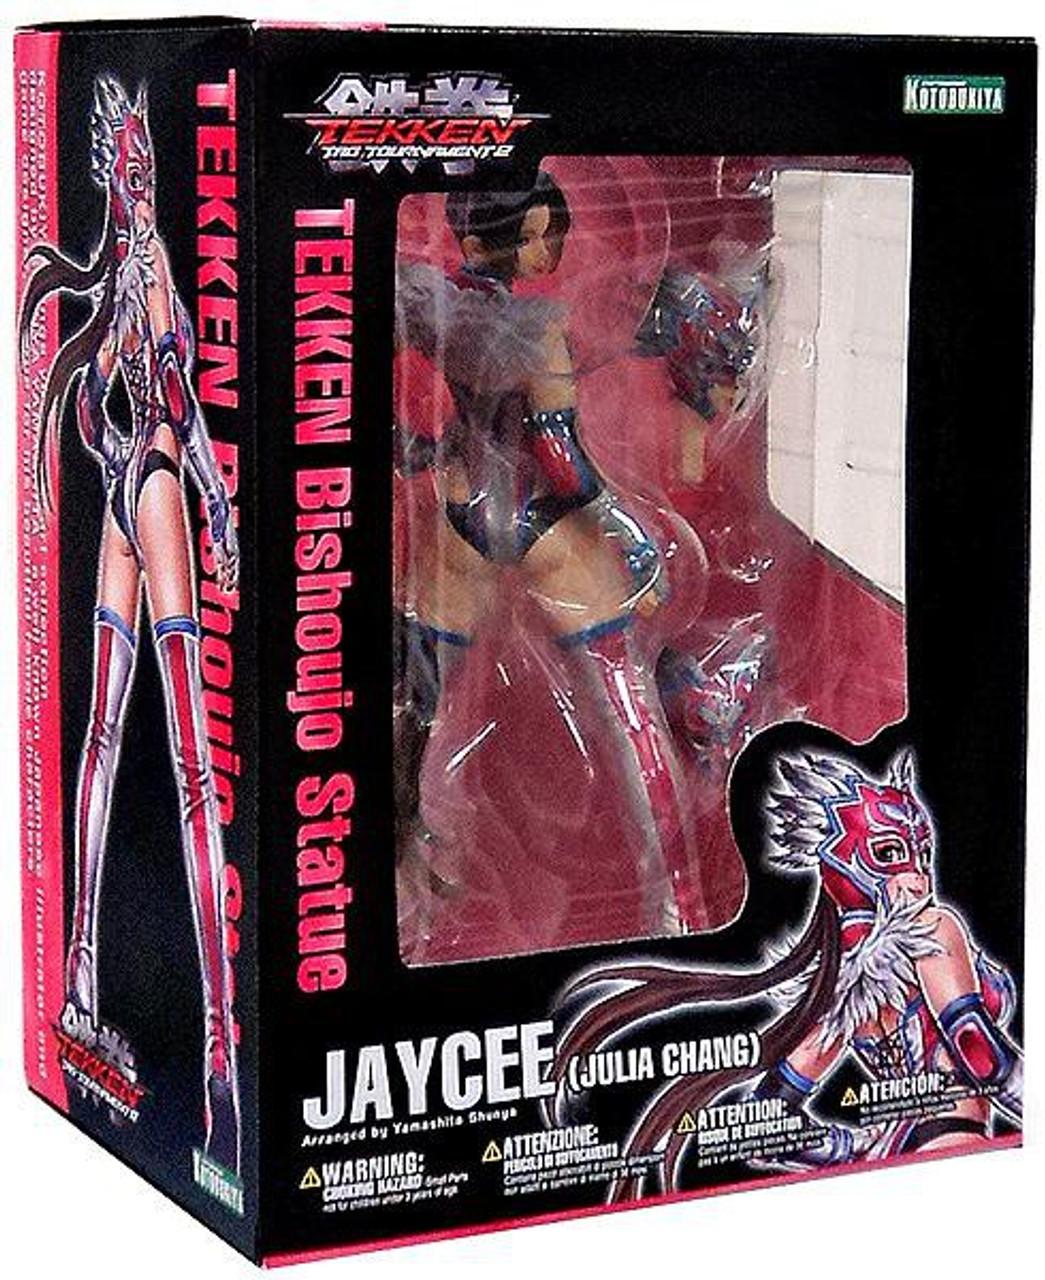 Kotobukiya Tekken Tag Tournament 2 Jaycee Bishoujo Statue